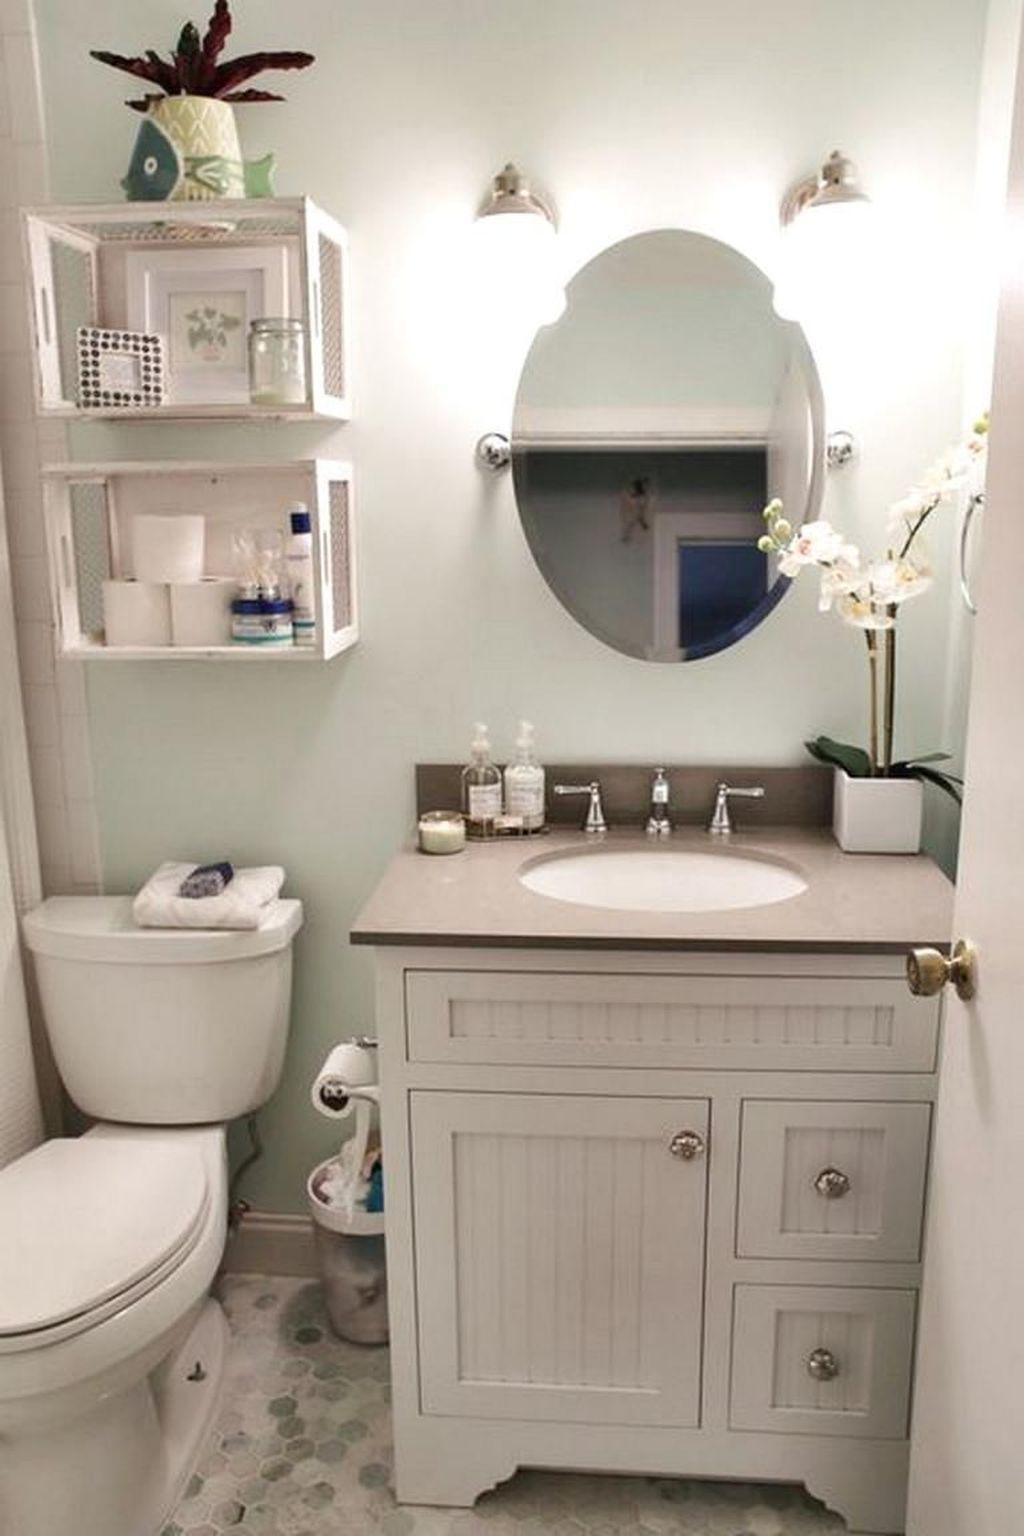 50 Brilliant Dorm Bathroom Decorating Ideas Bathroom in dimensions 1024 X 1536